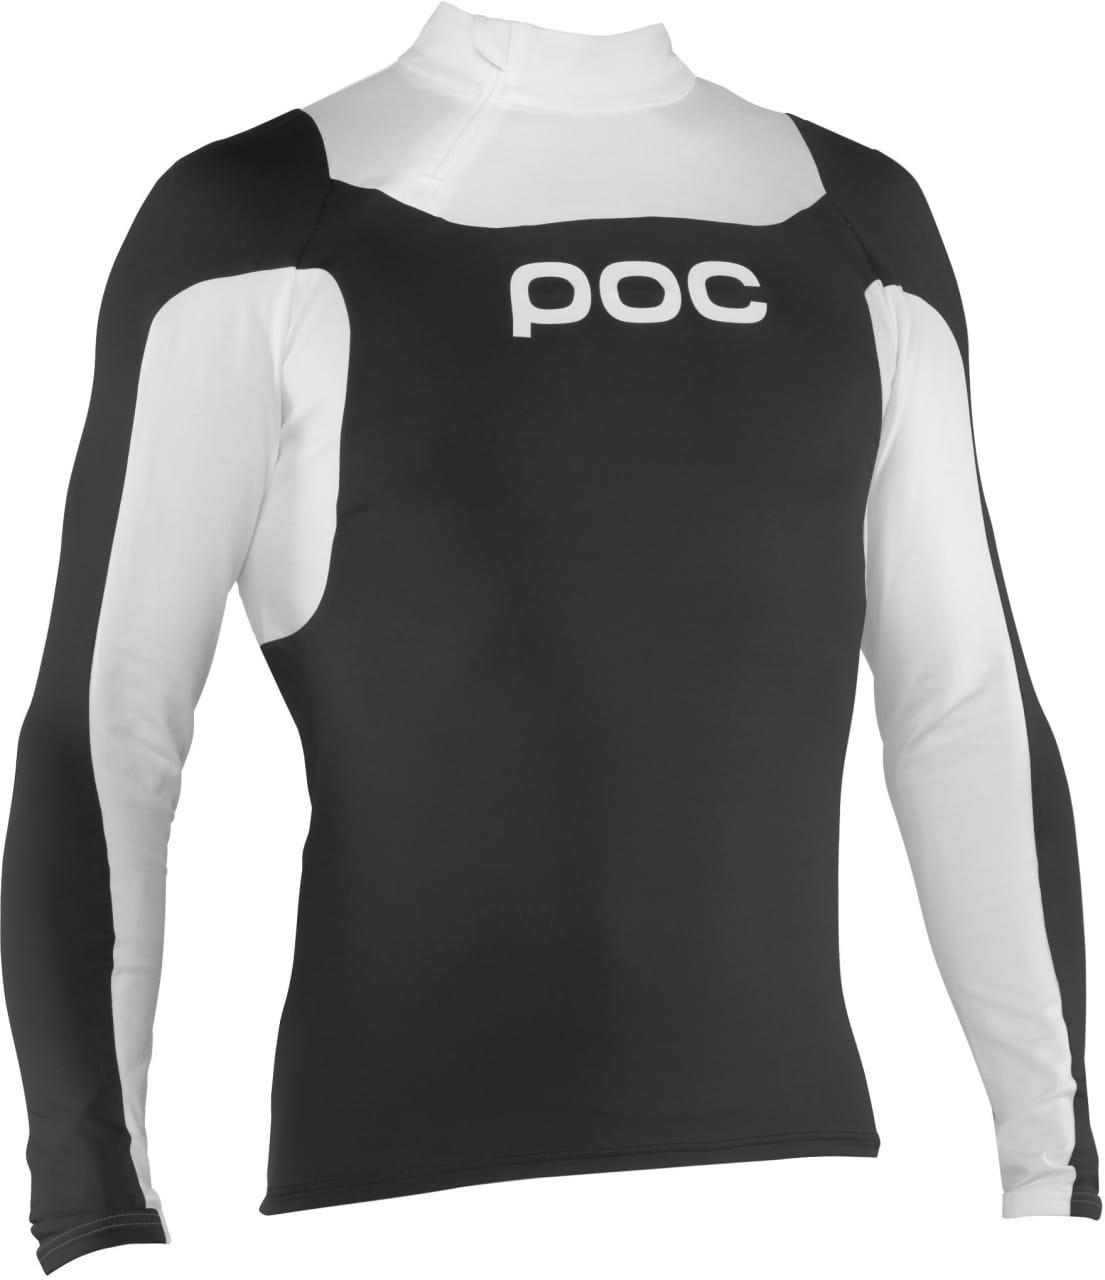 Ochranné triko s dlouhým rukávem POC Layer Cut Suit Top